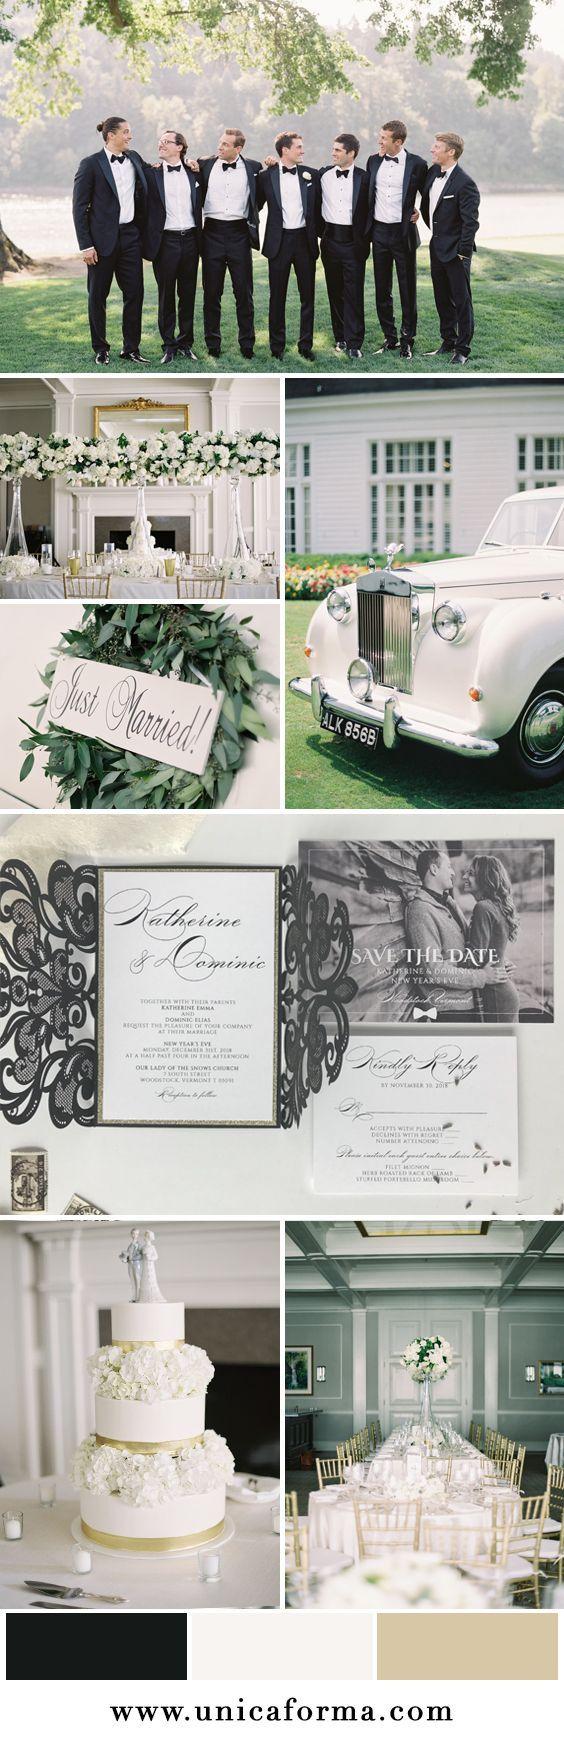 16173 best Wedding Invitation images on Pinterest | Weddings ...